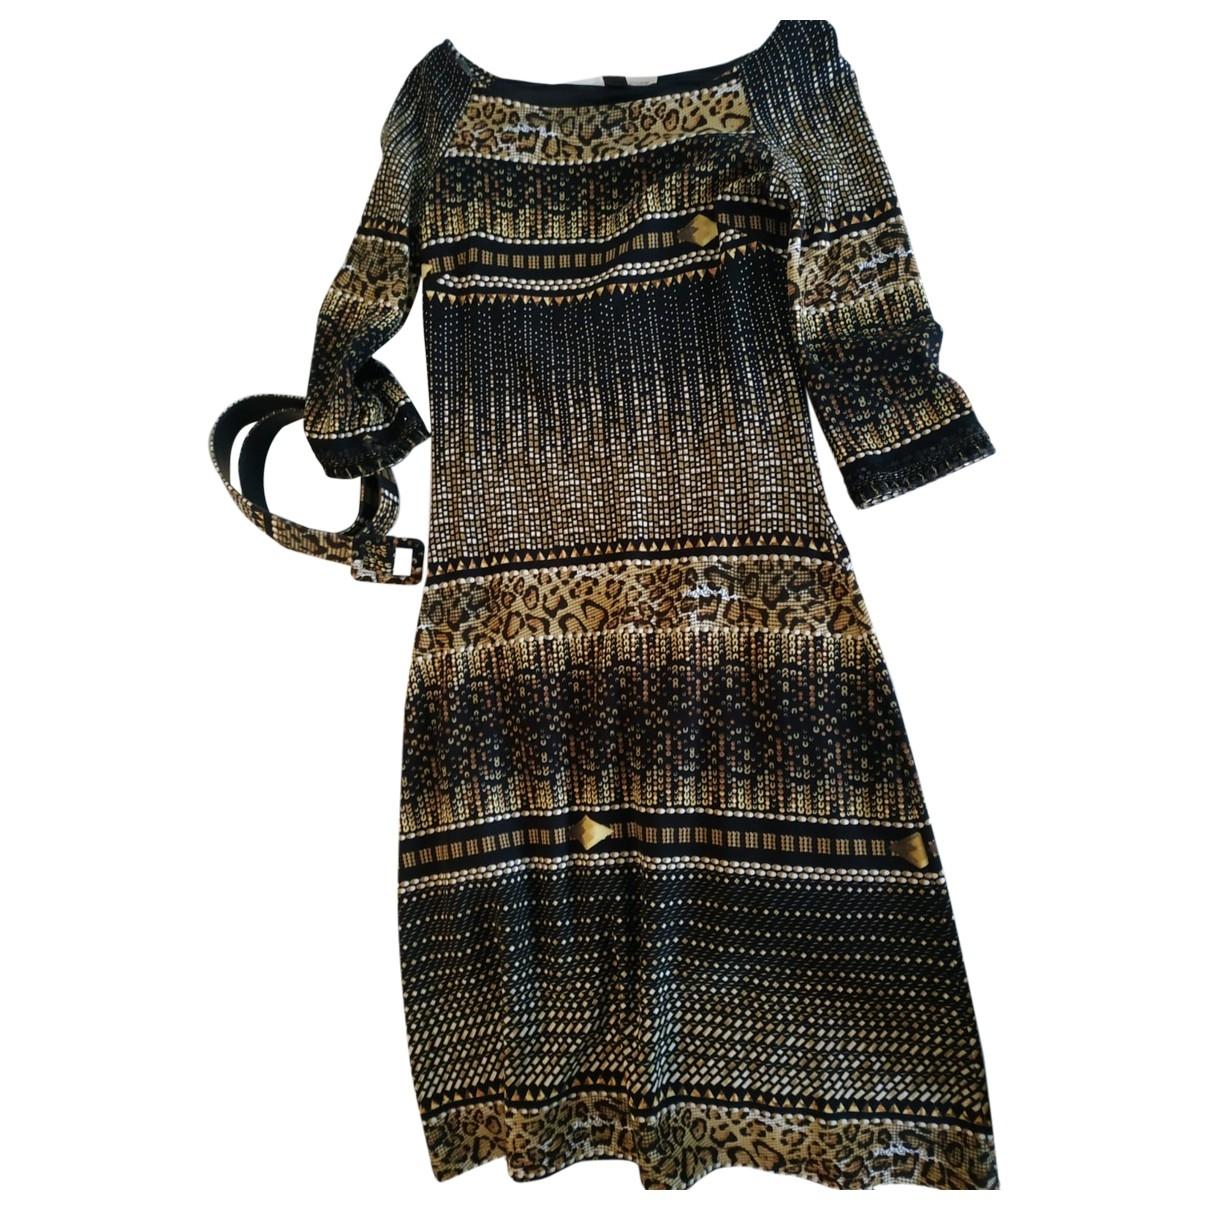 Class Cavalli \N Multicolour dress for Women 42 IT